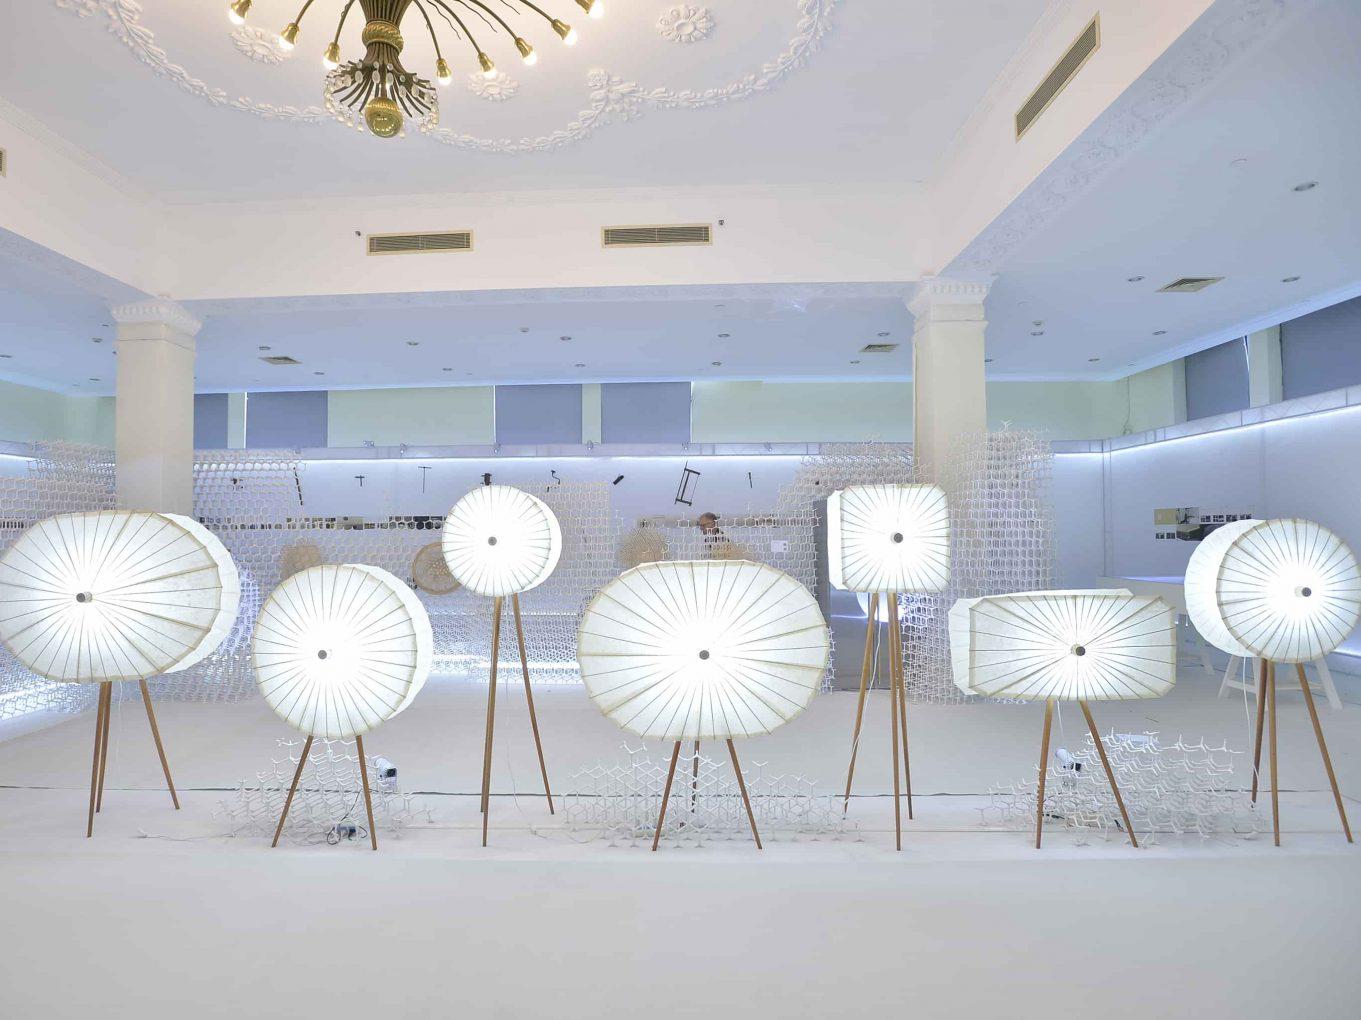 design shanghai 2019 Design Shanghai 2019 Design Shangai 2019 Event Guide Design Shanghai 2016 11 min